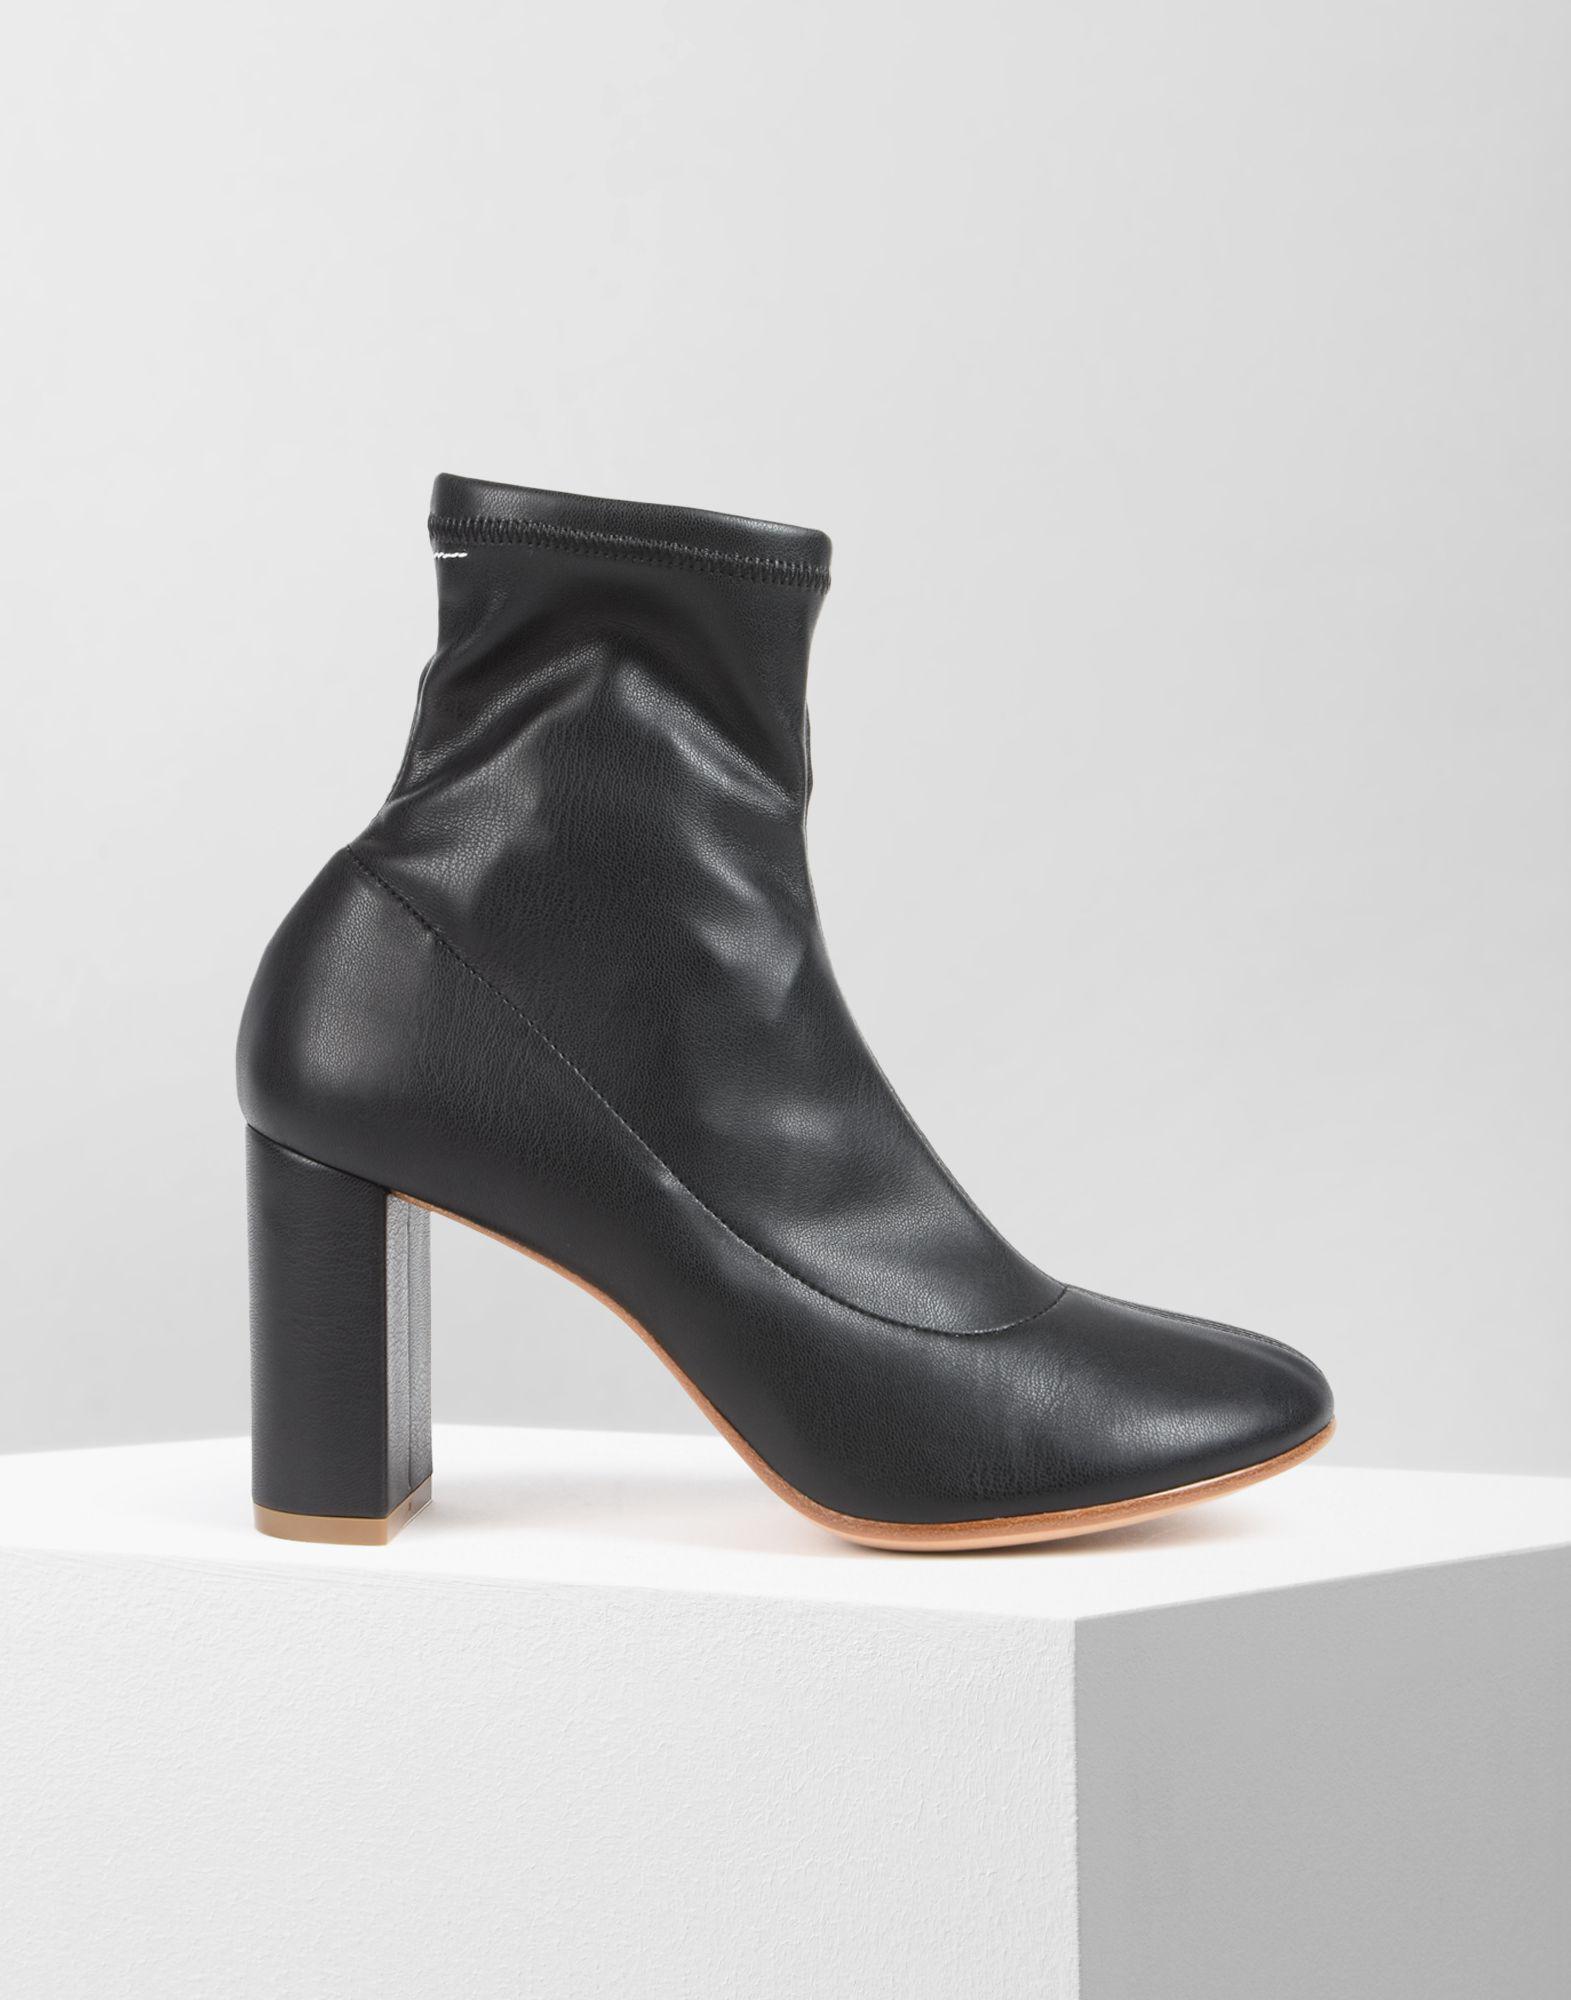 MM6 Maison Martin Margiela Black Pump-Sock Ankle Boots FYsR1